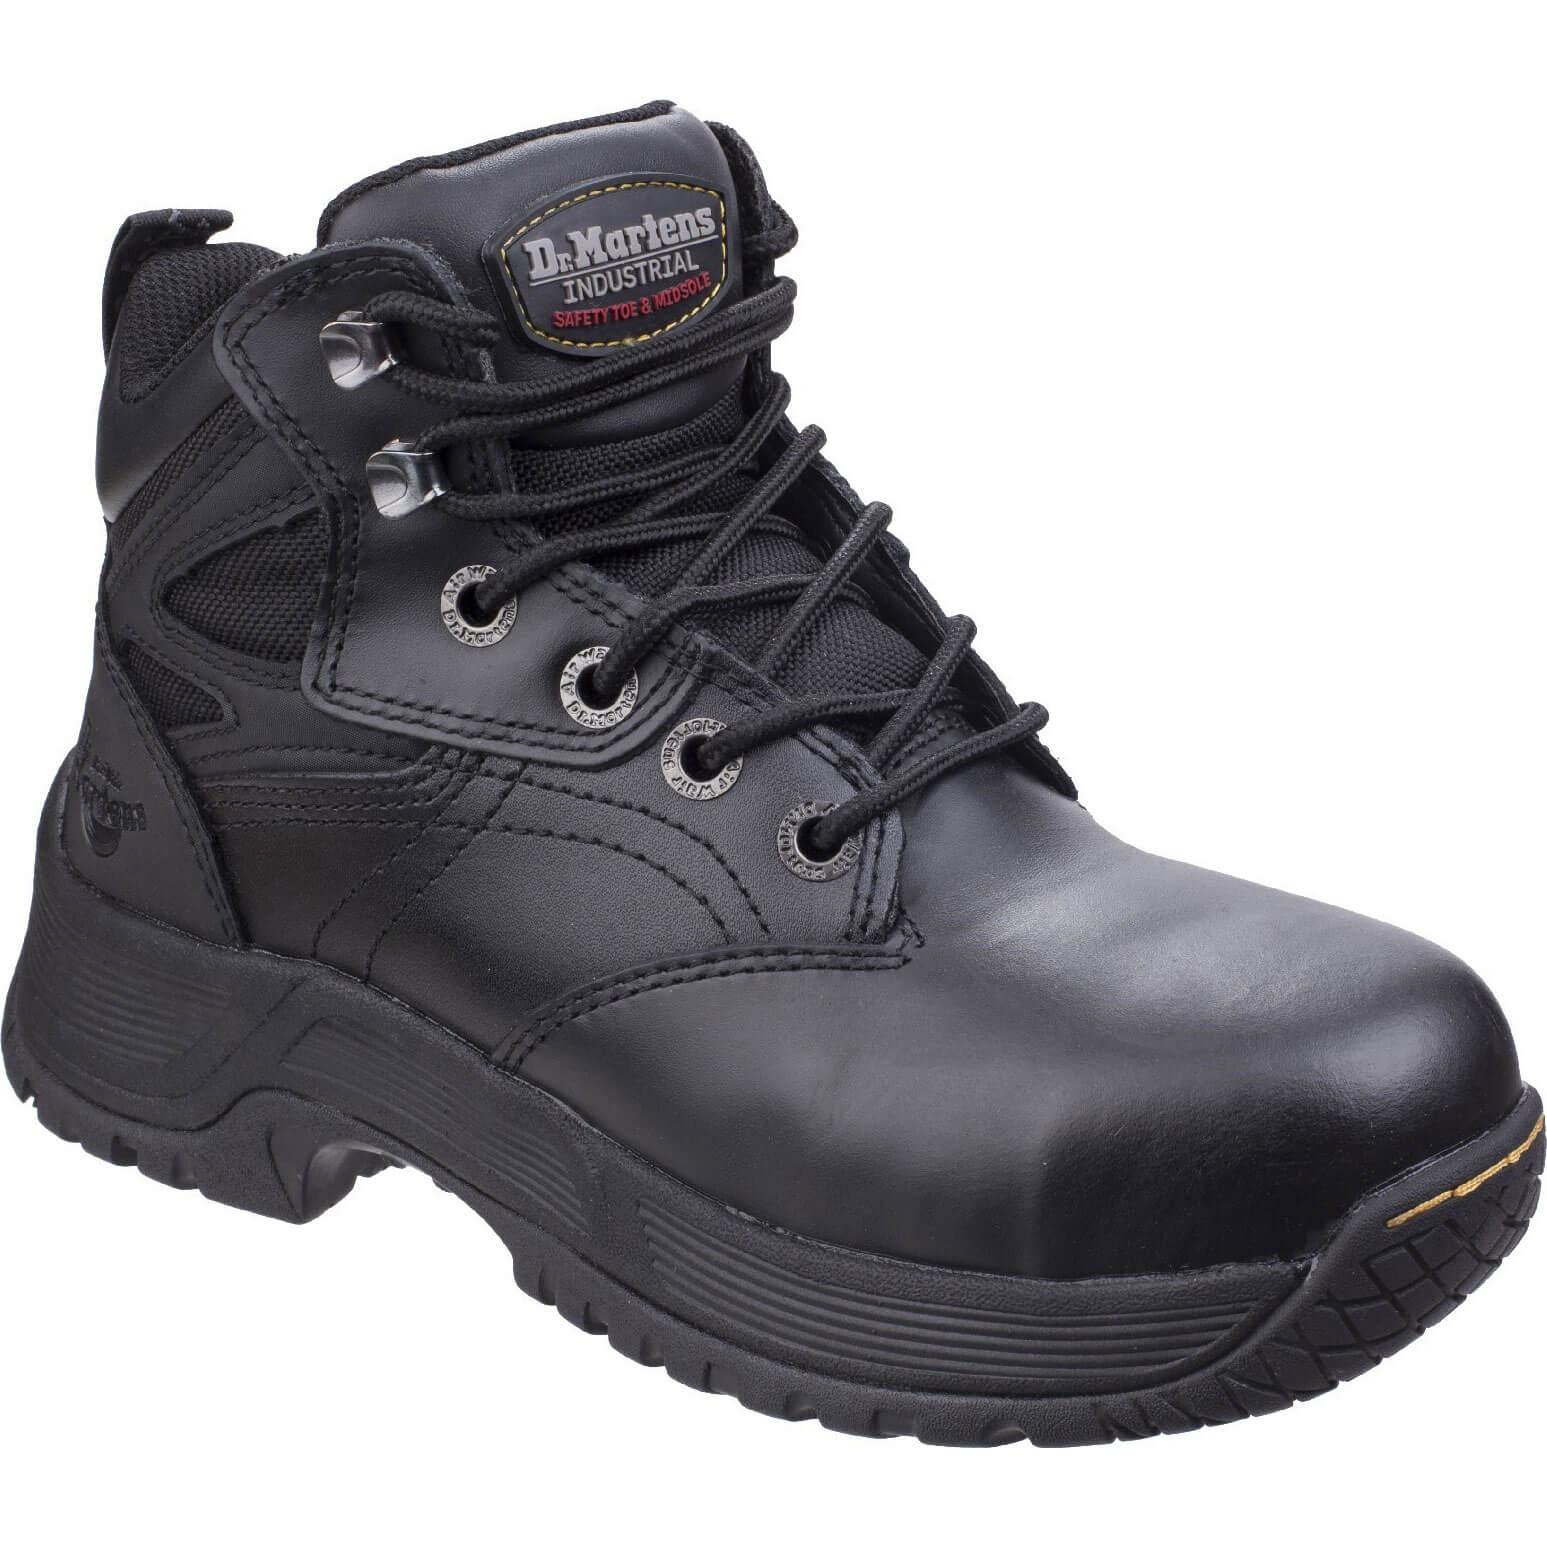 CHEAP Dr Martens Mens Torness Mens Safety Boots Black Size 5 – Men's Footwear